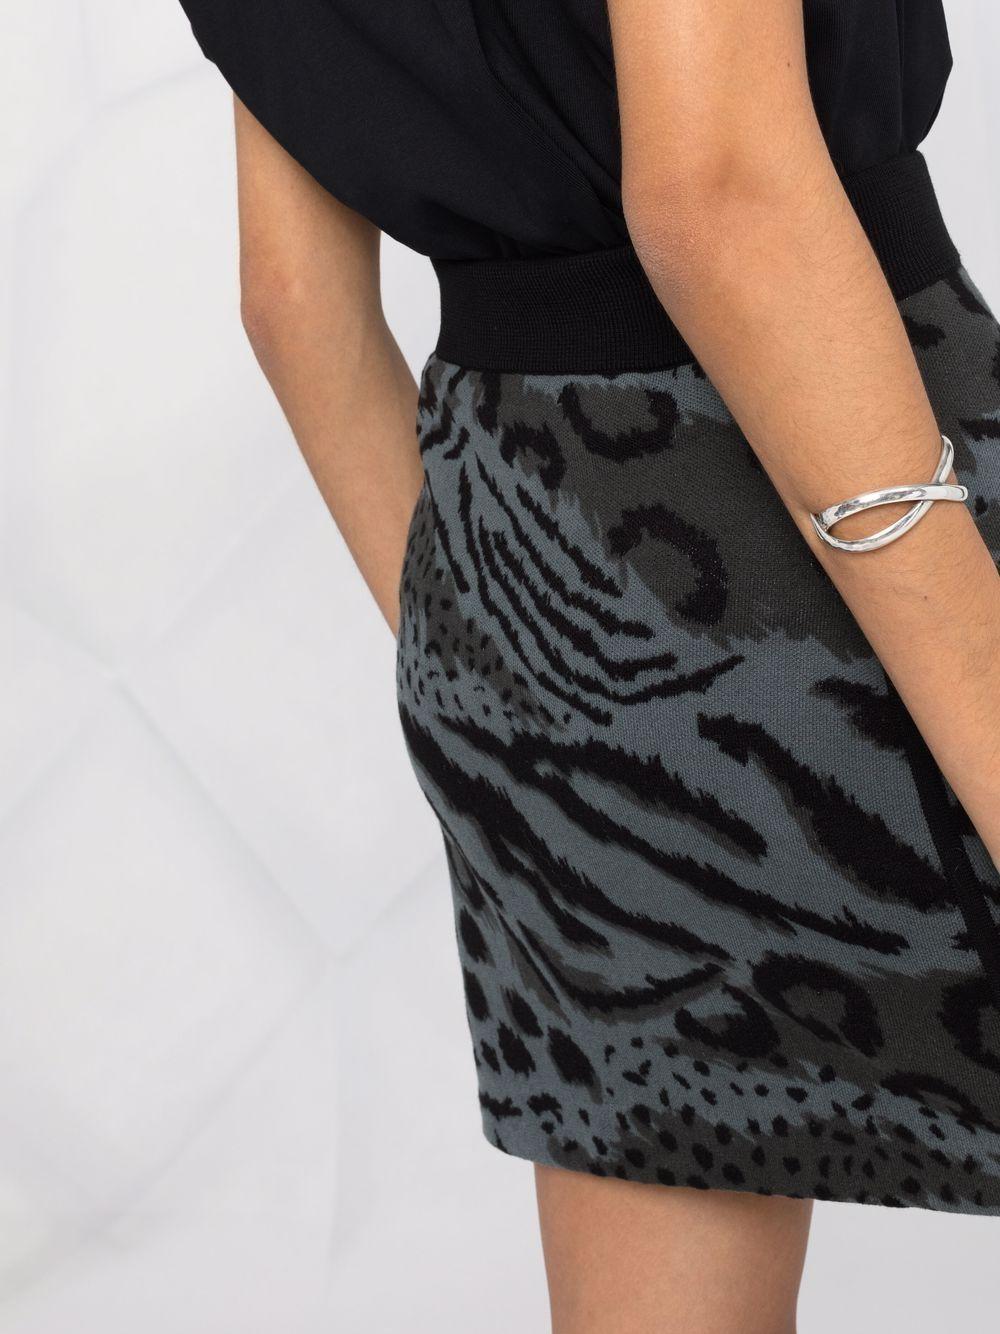 Black and charcoal-grey wool animal print knitted skirt  KENZO      FB6-2JU627-3CF96